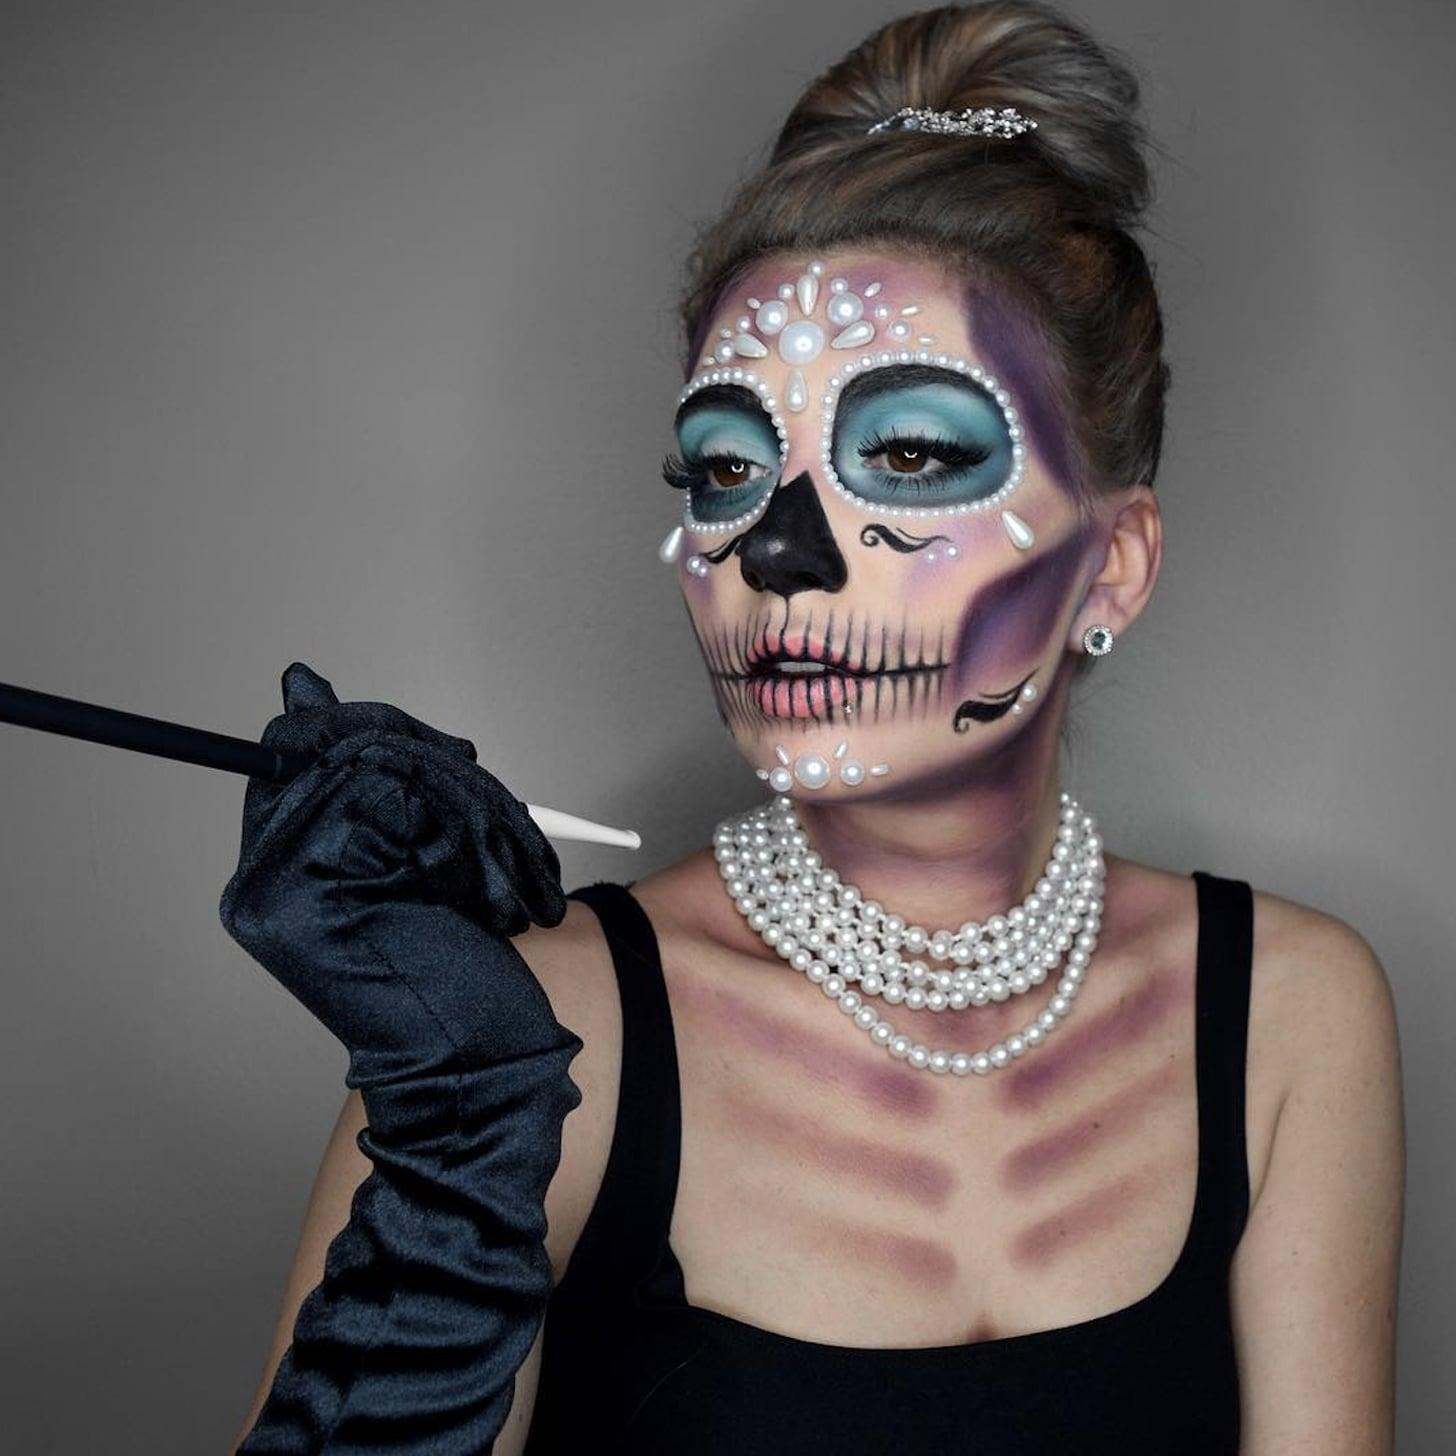 Best Halloween Specials To Look For 2020 Best Cheap Homemade Halloween Costumes | 2020 | POPSUGAR Smart Living